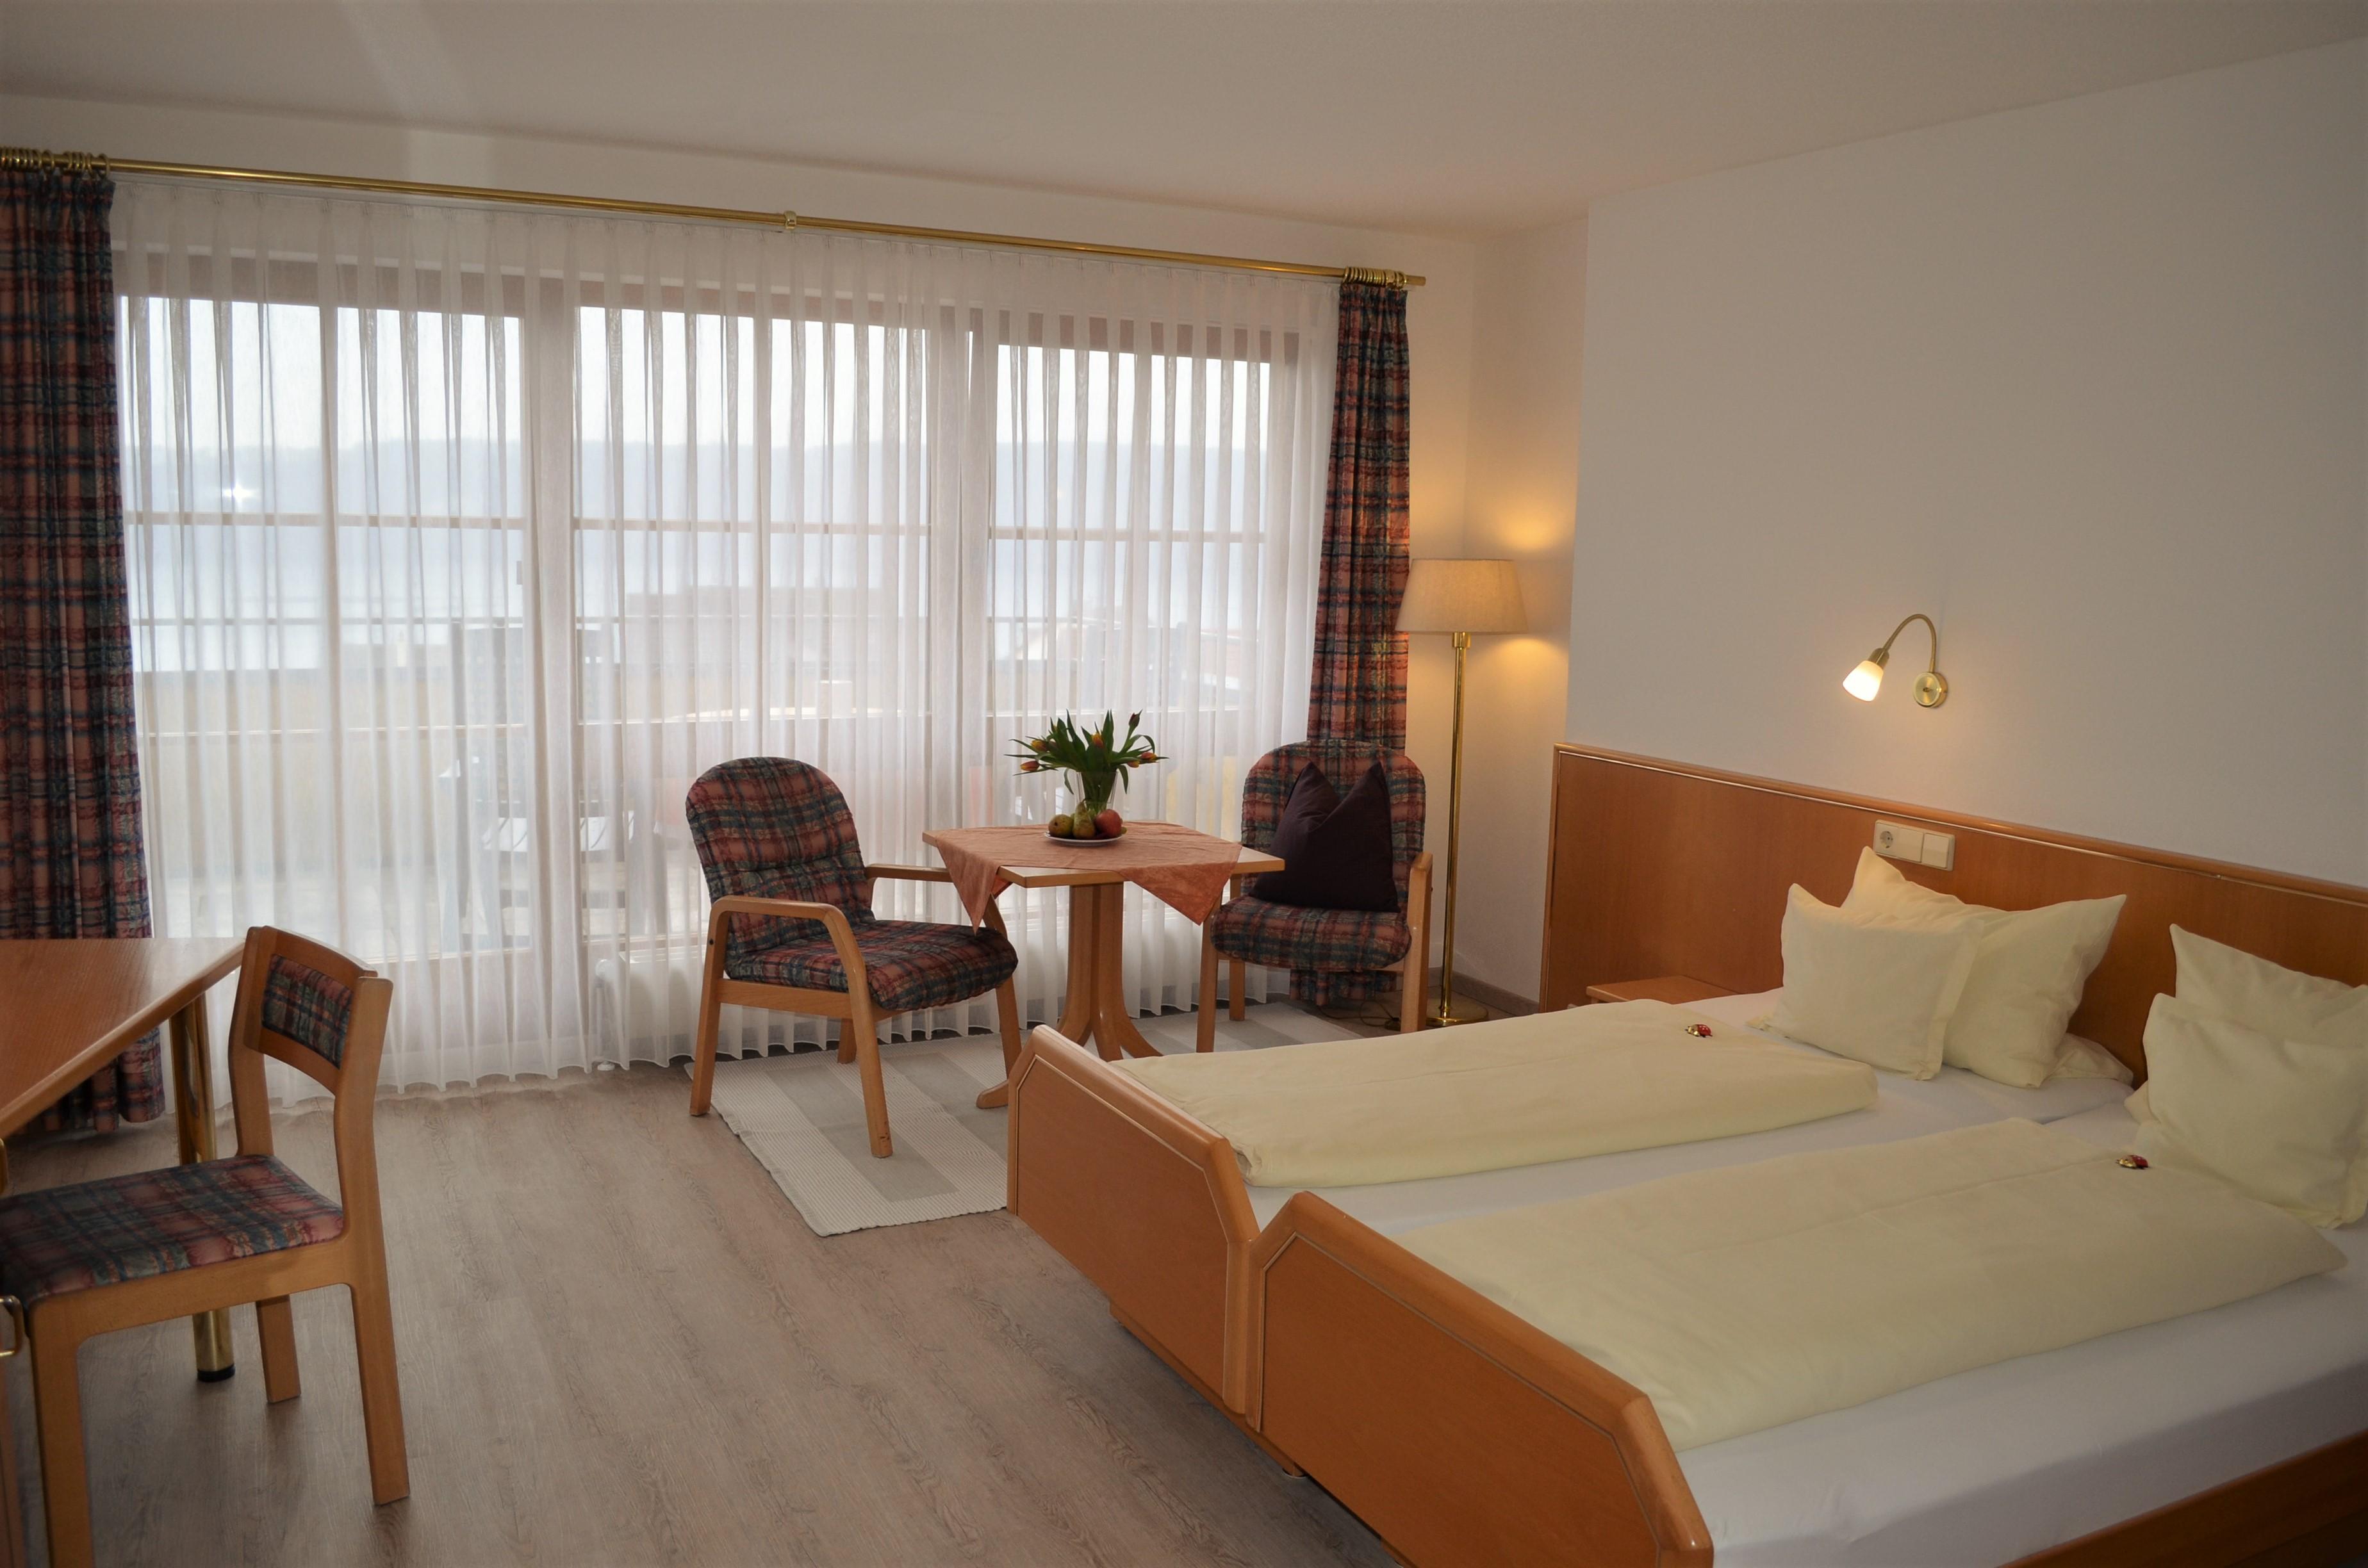 Doppelzimmer Kat.A- double room